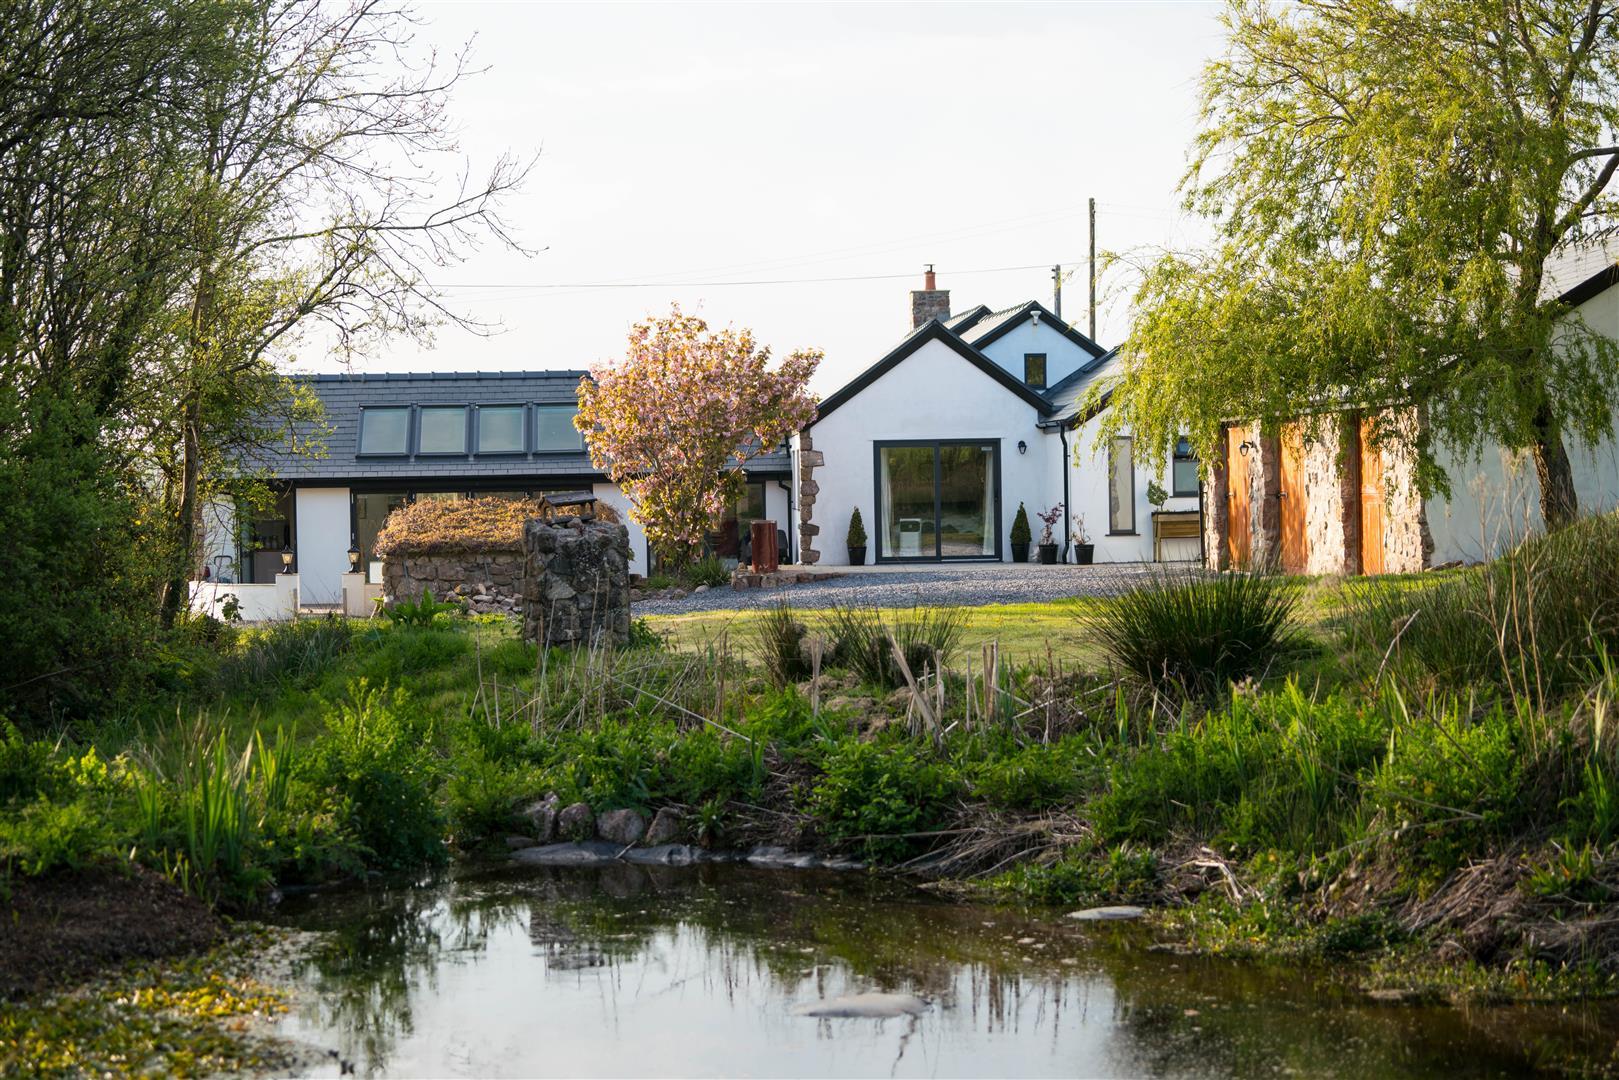 Lower Mill, Moor Lane, Llangennith, SA3 1HU